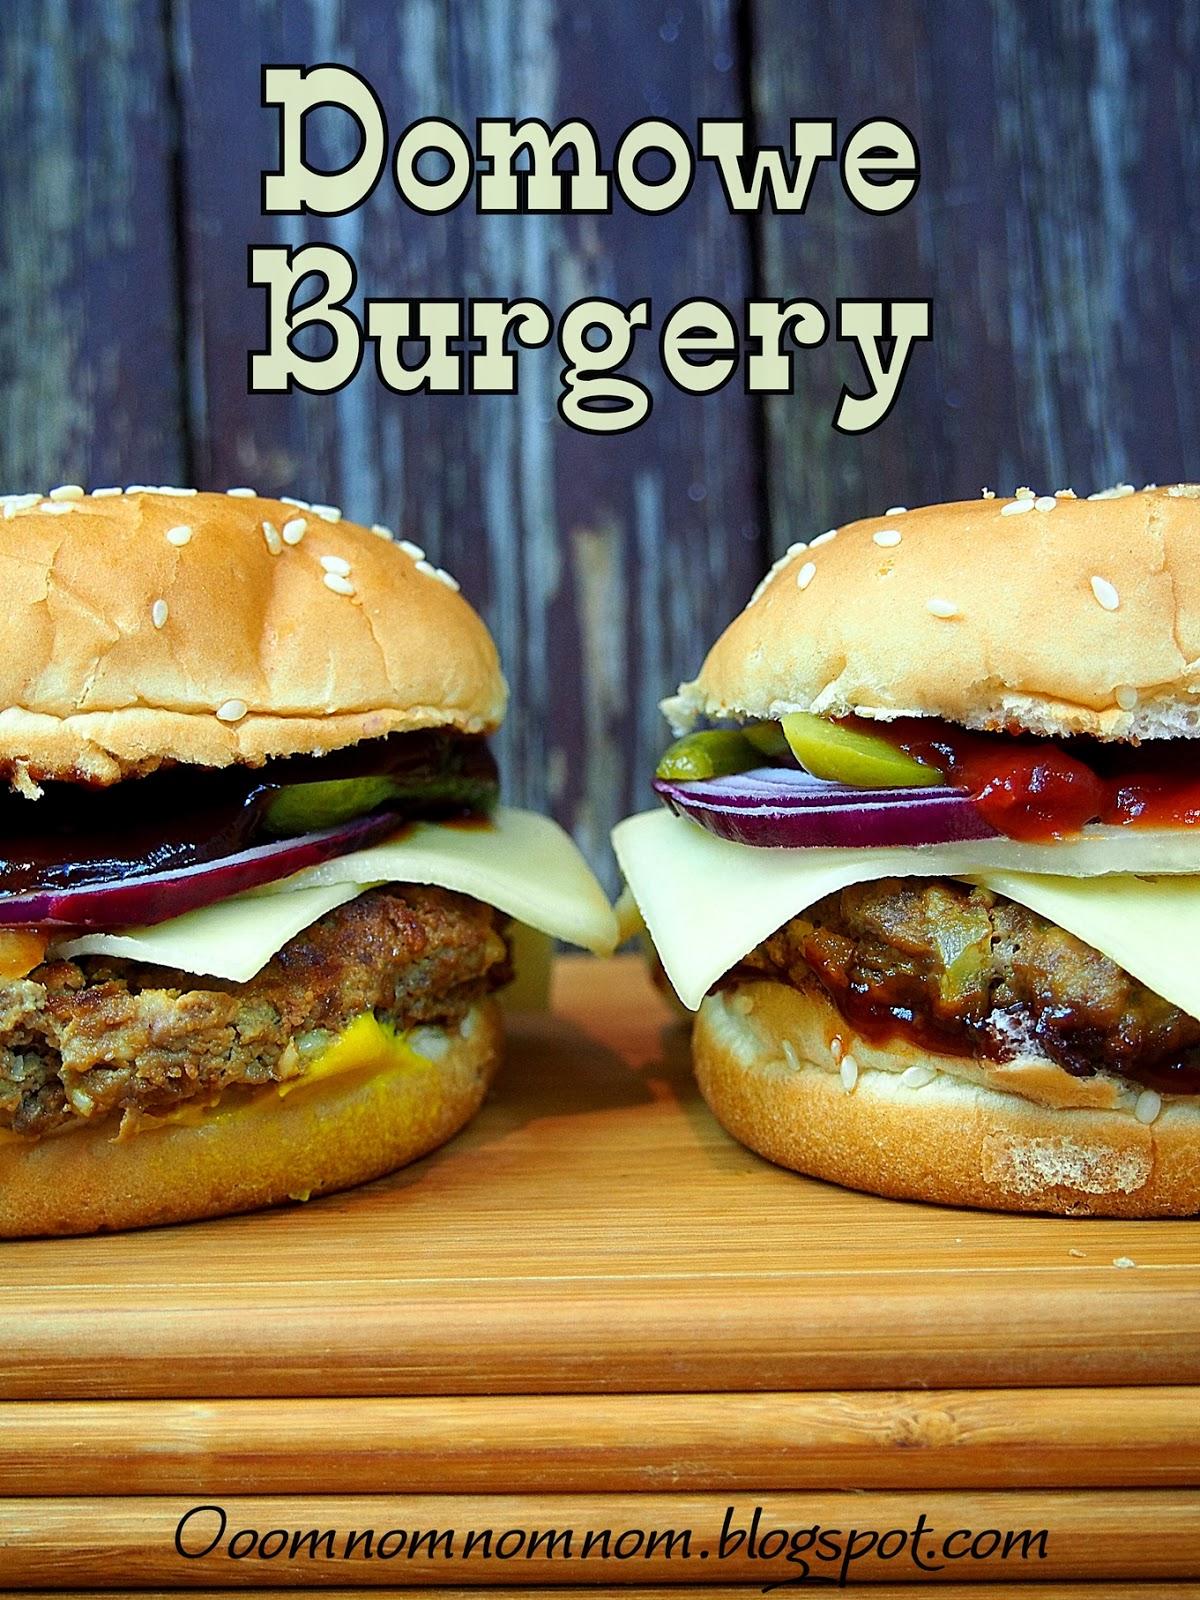 Ooomnomnomnom Pyszne Domowe Burgery Hamburgery Czyli